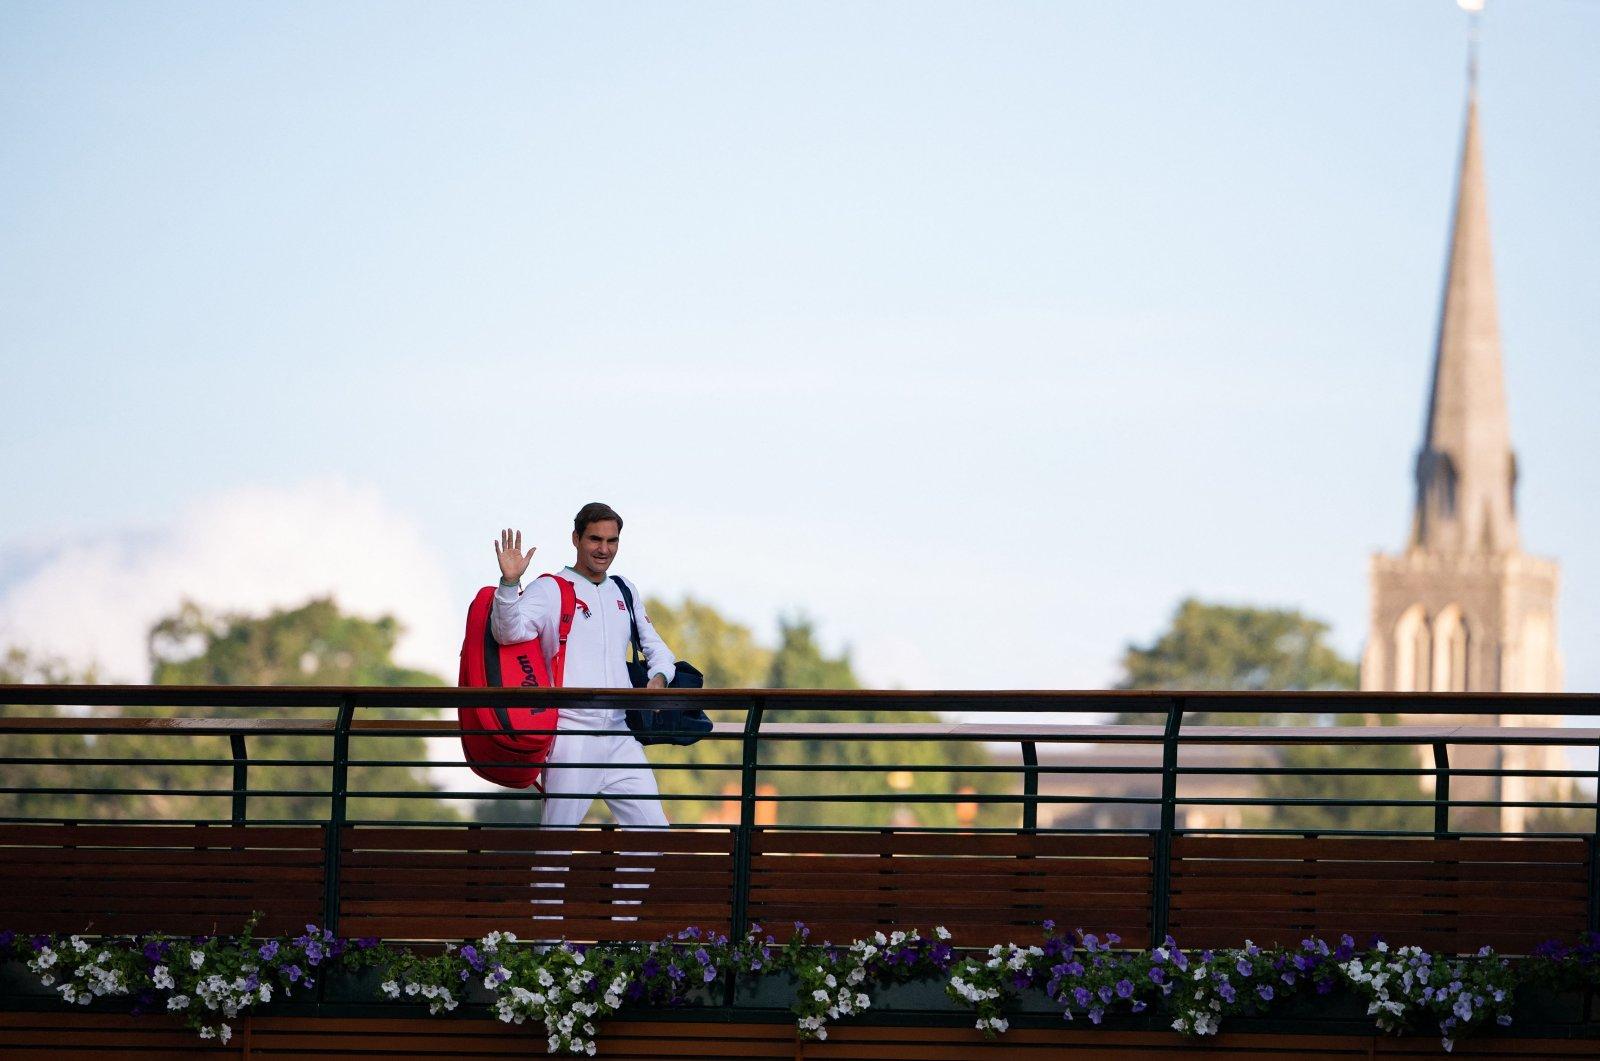 Switzerland's Roger Federer waves to fans after losing his men's quarter-finals match at the 2021 Wimbledon Championships, Wimbledon, southwest London, U.K., July 7, 2021. (AFP Photo)